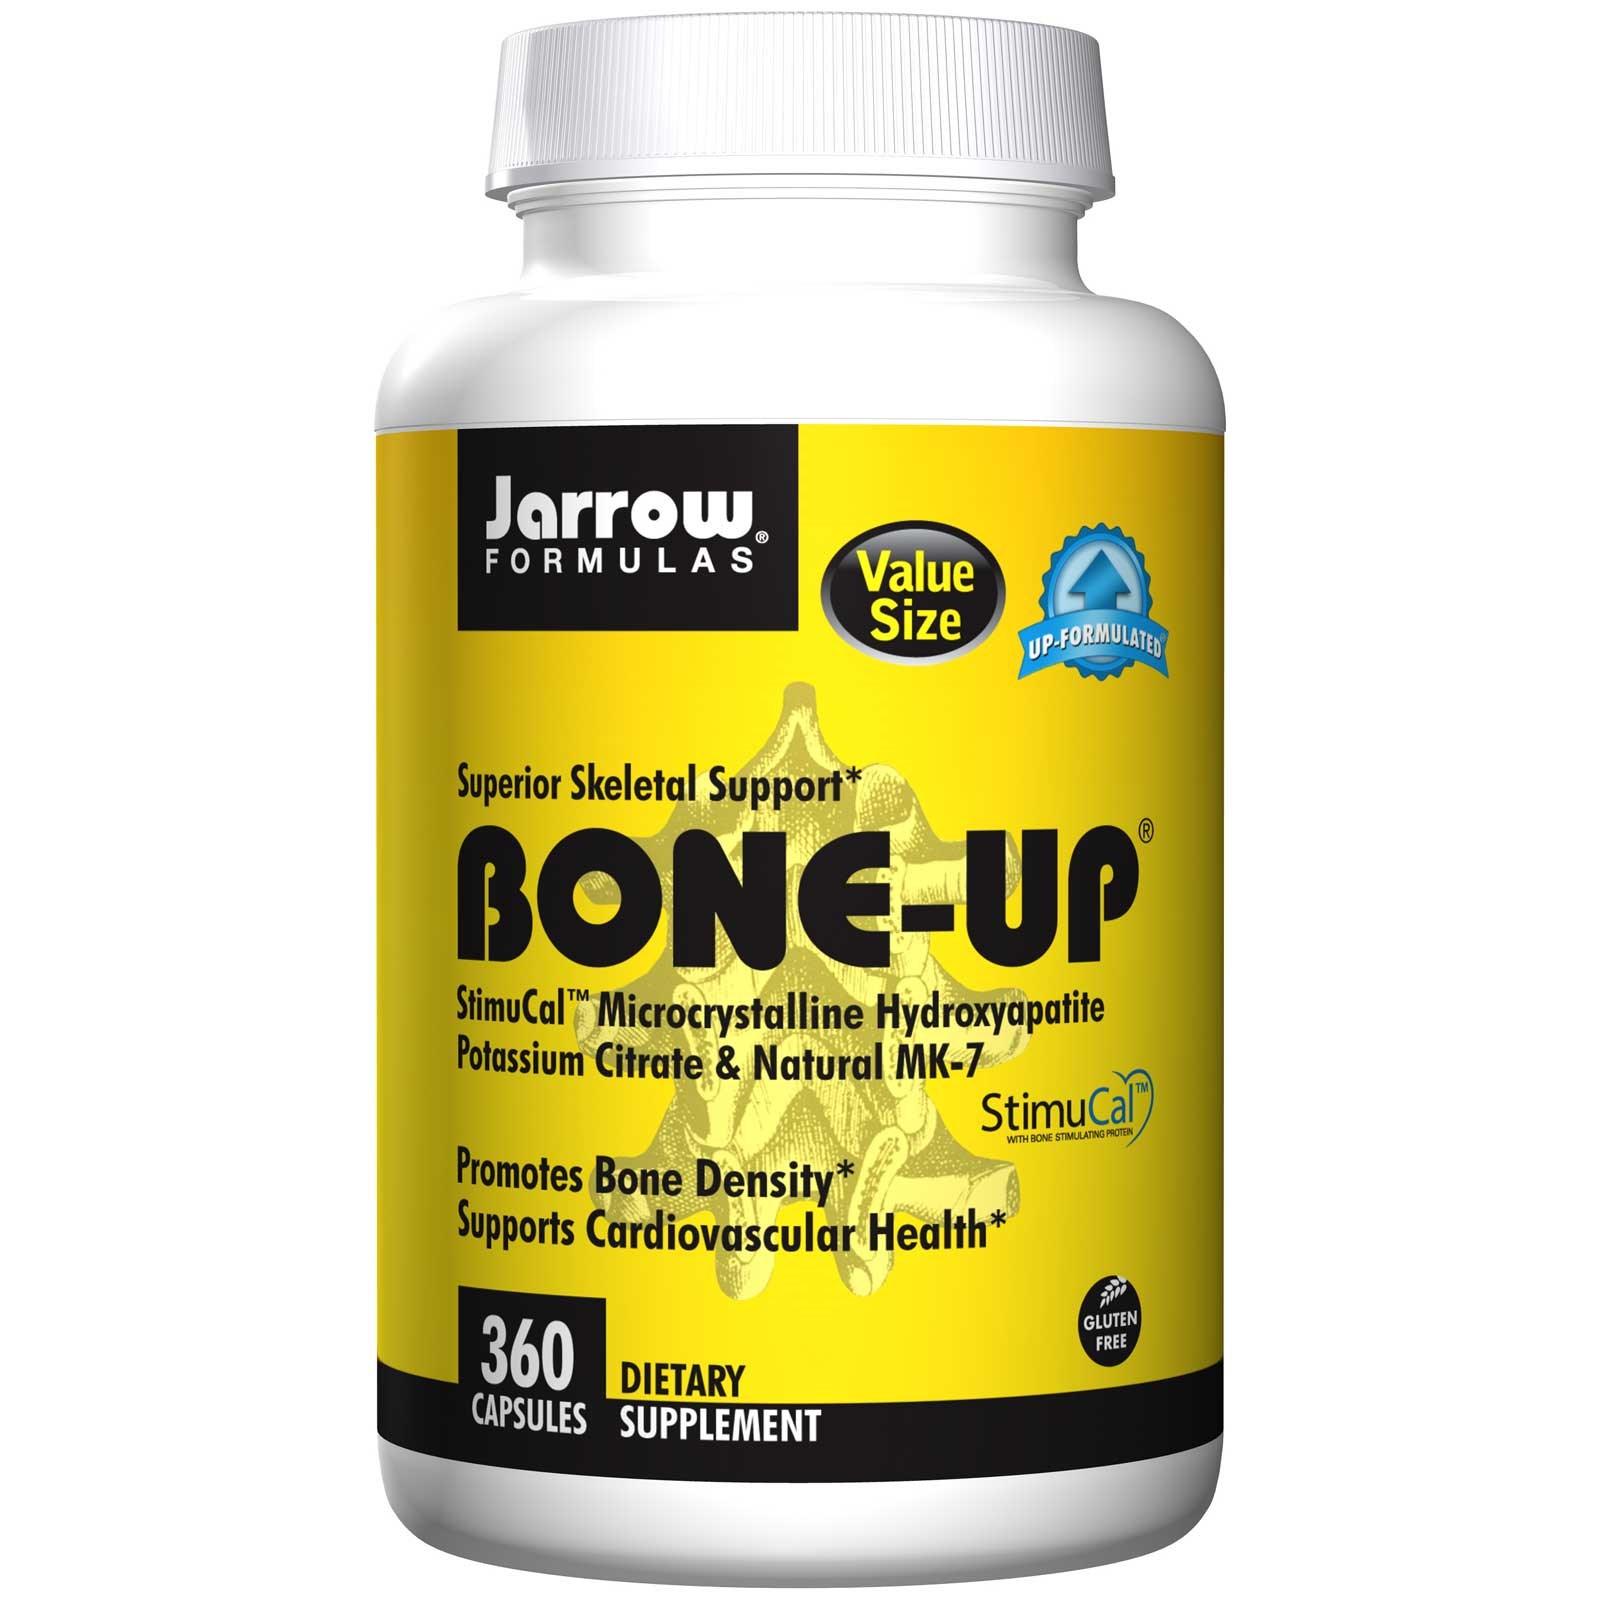 Image of Bone-Up (360 Capsules) - Jarrow Formulas 0790011048053